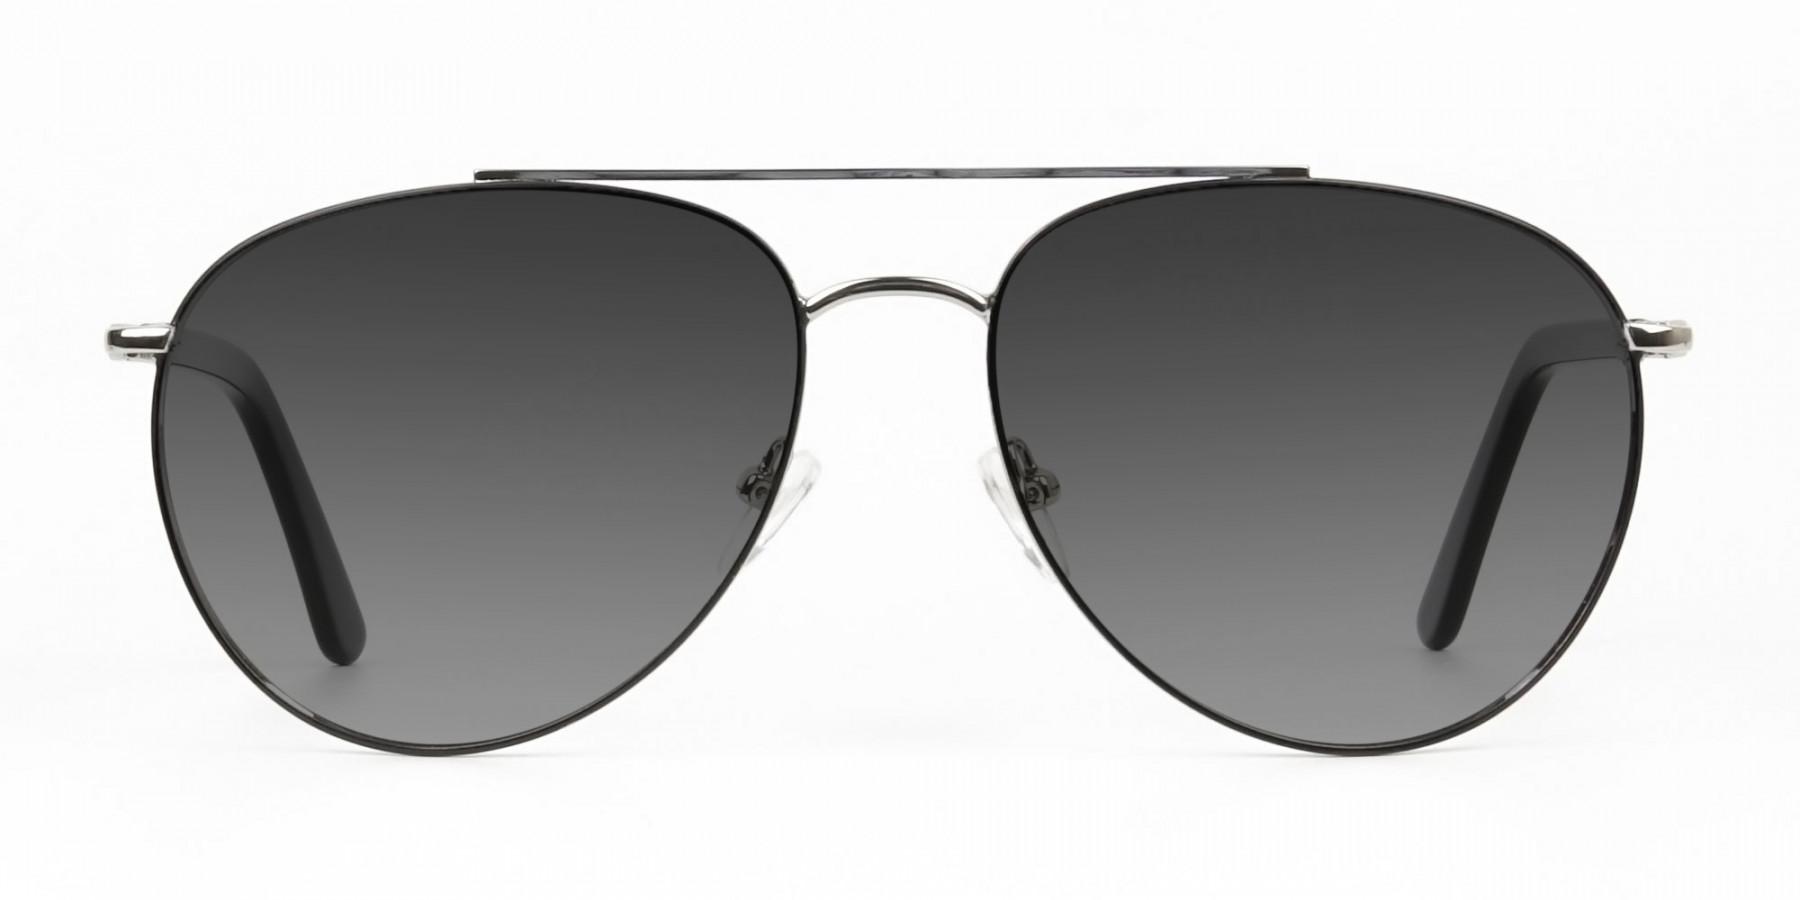 ultralight-black-silver-aviator-grey-tinted-sunglasses-frames-3